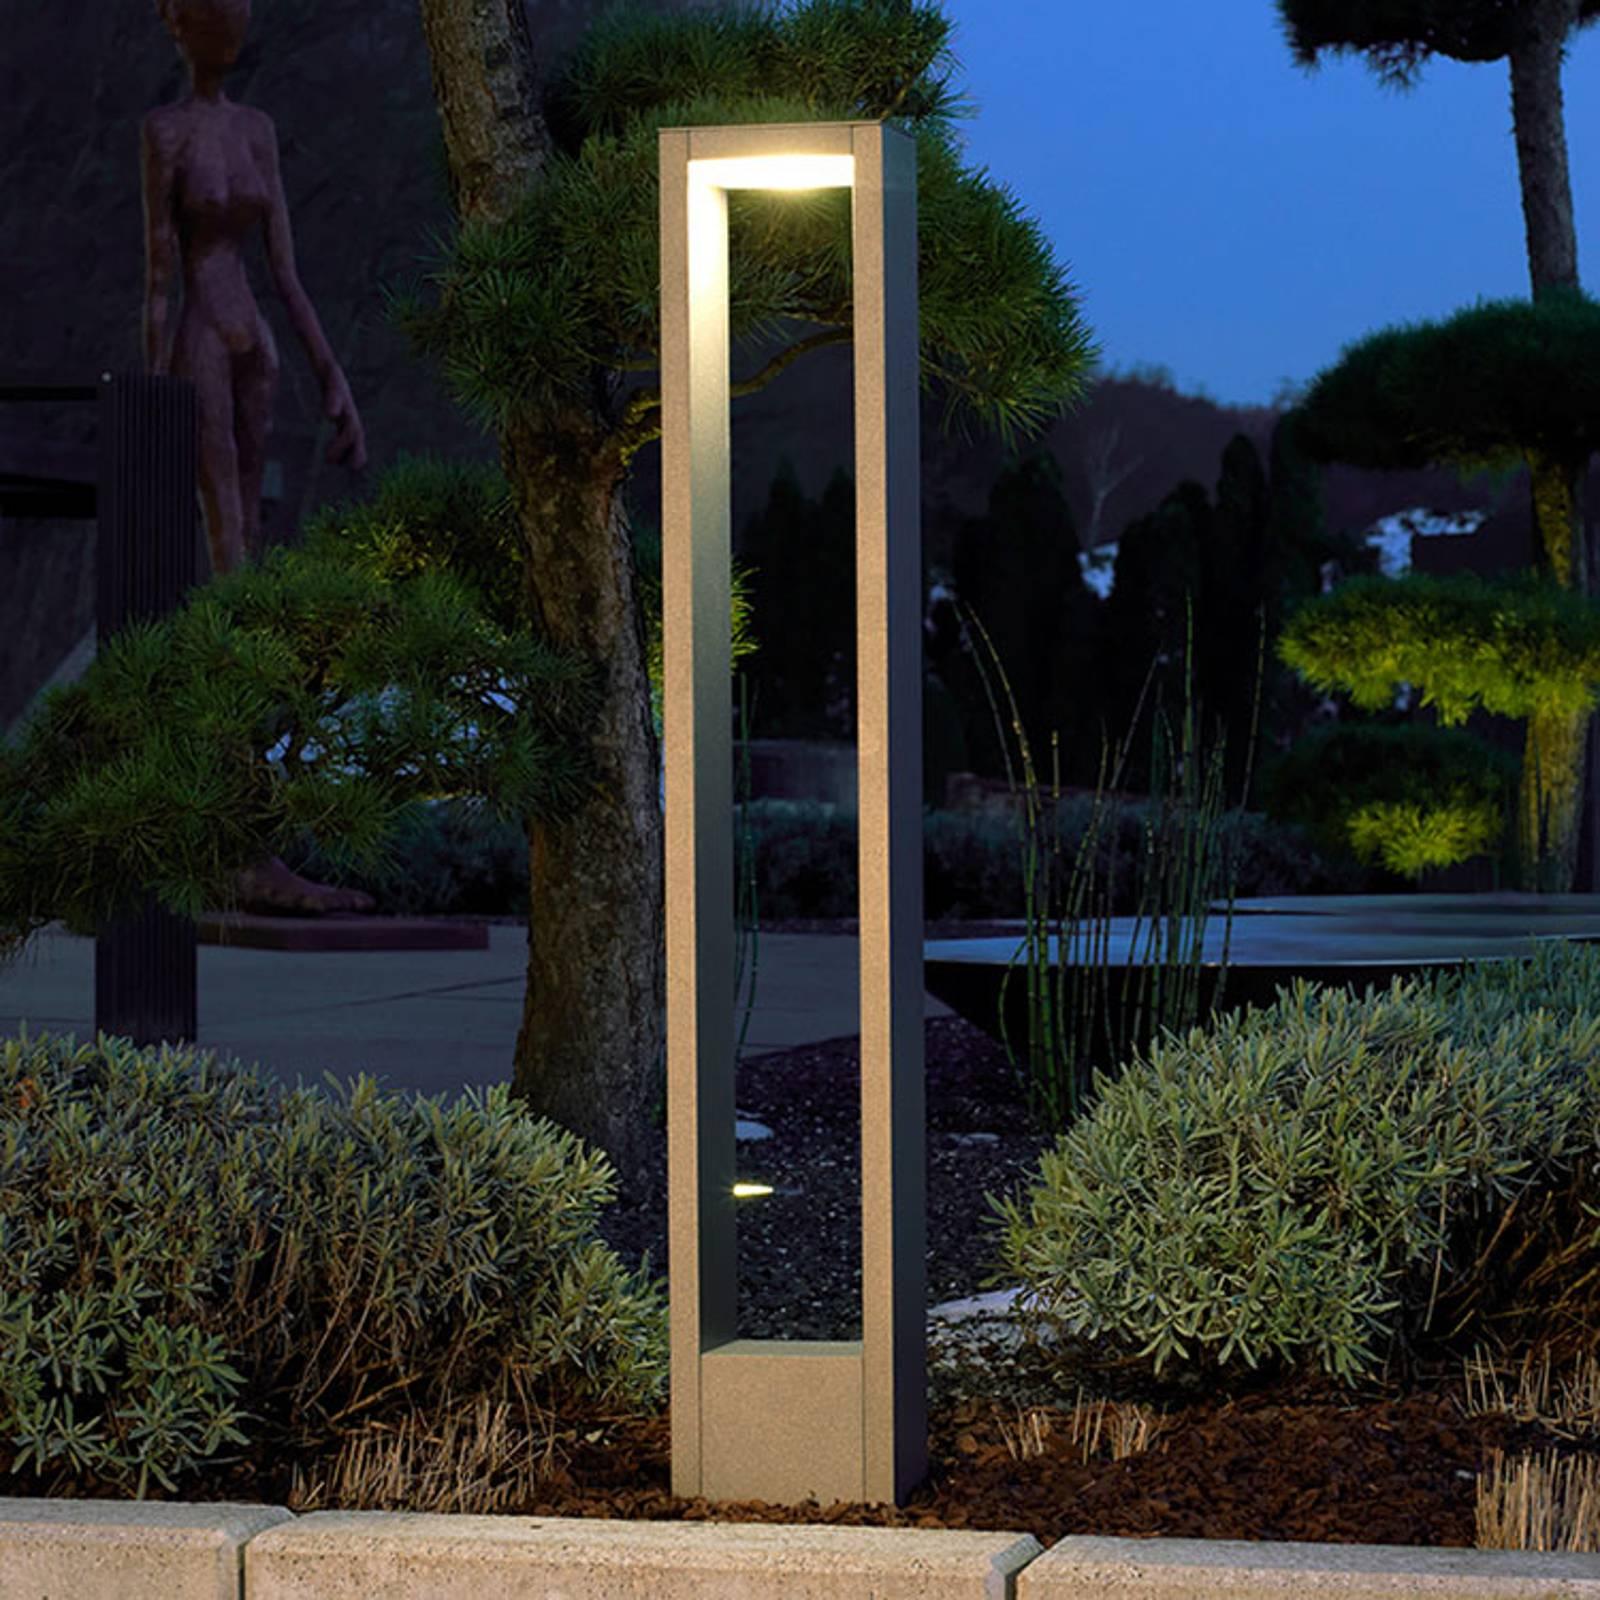 Adriana - framevormige LED tuinpadverlichting